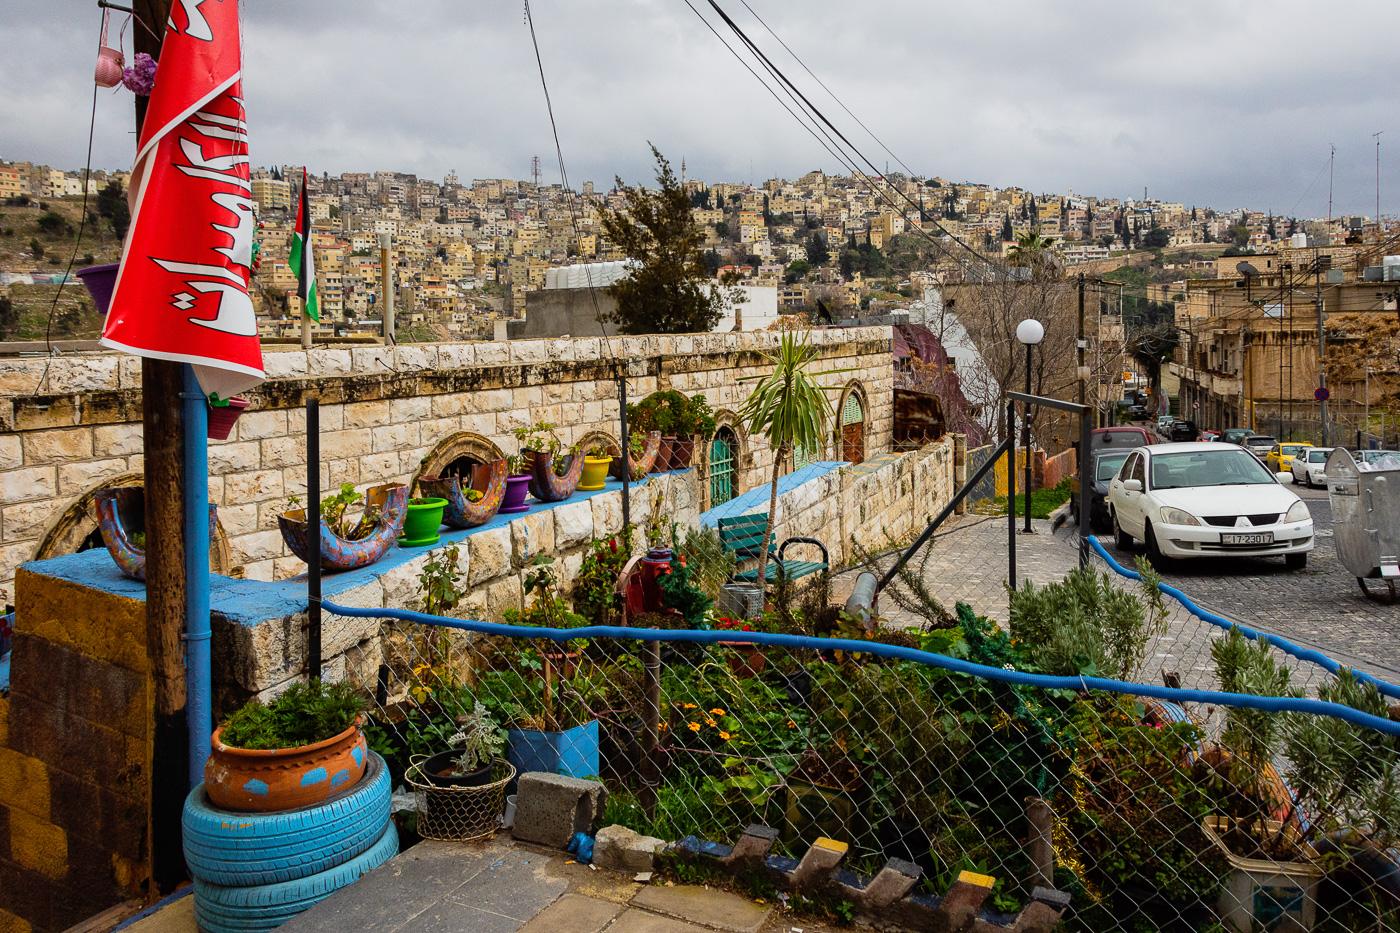 A Day in Amman: Walk, Eat, Shop!